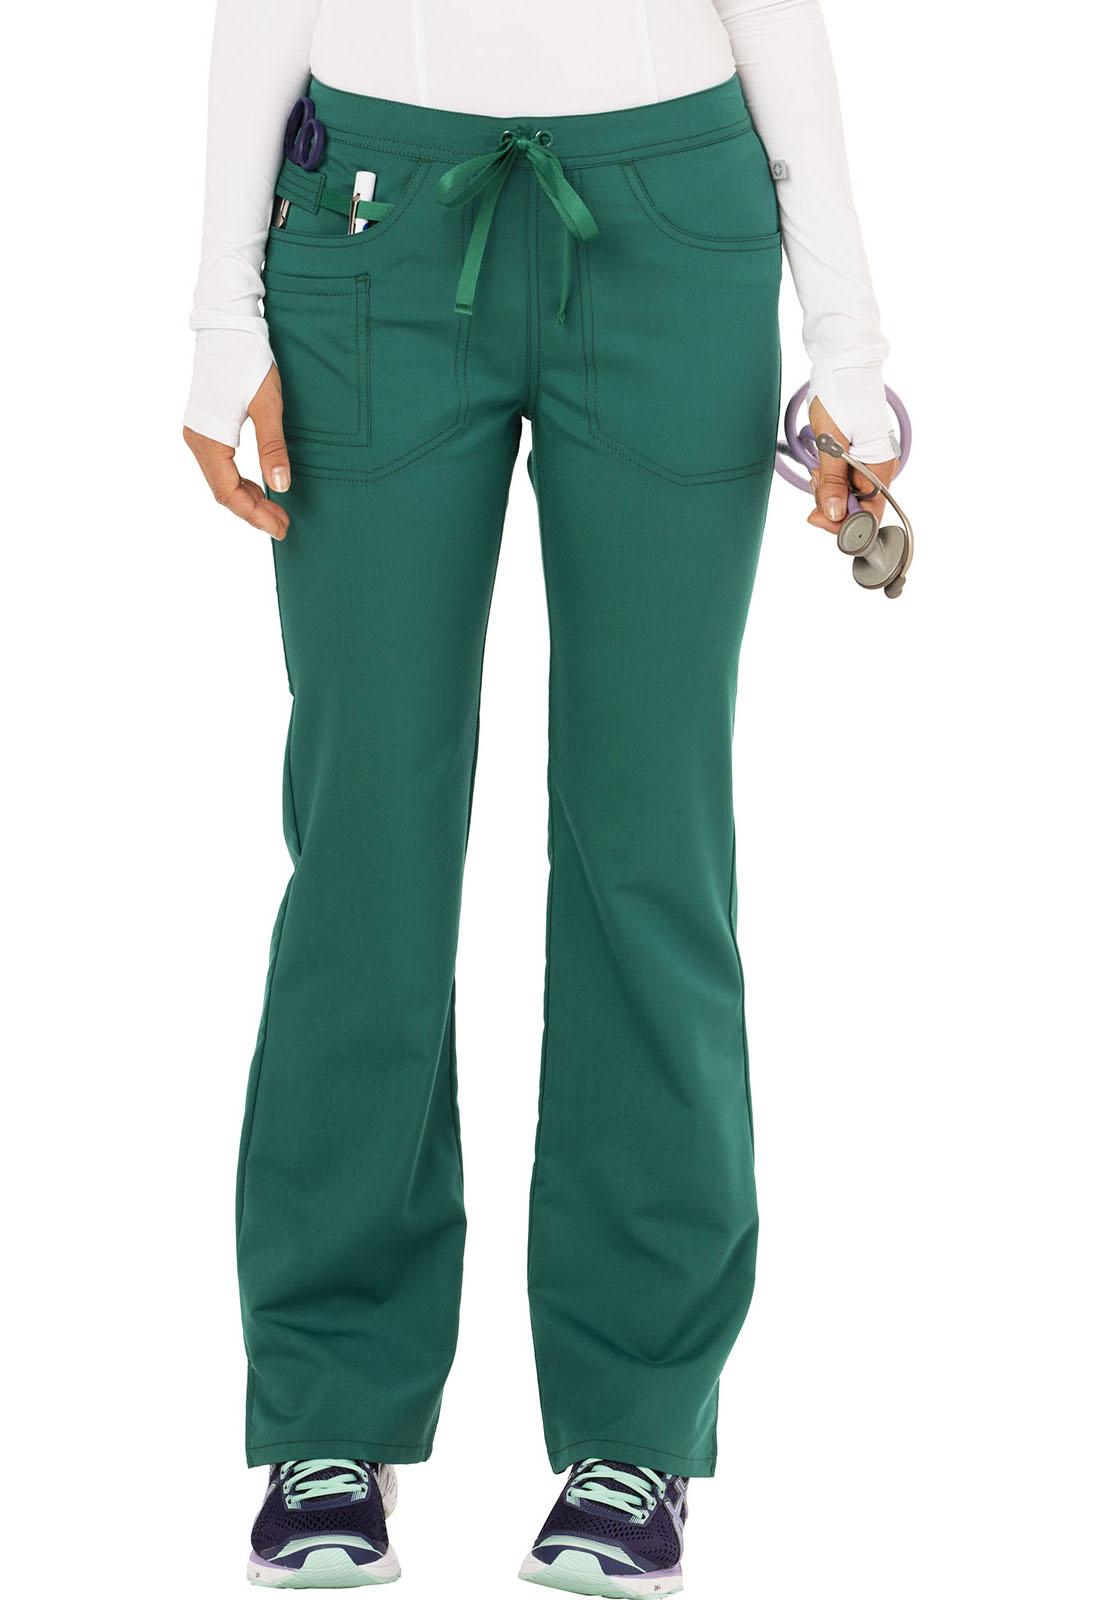 2b82379b73b Code Happy Cloud Nine Women's Mid Rise Moderate Flare Leg Pant Green